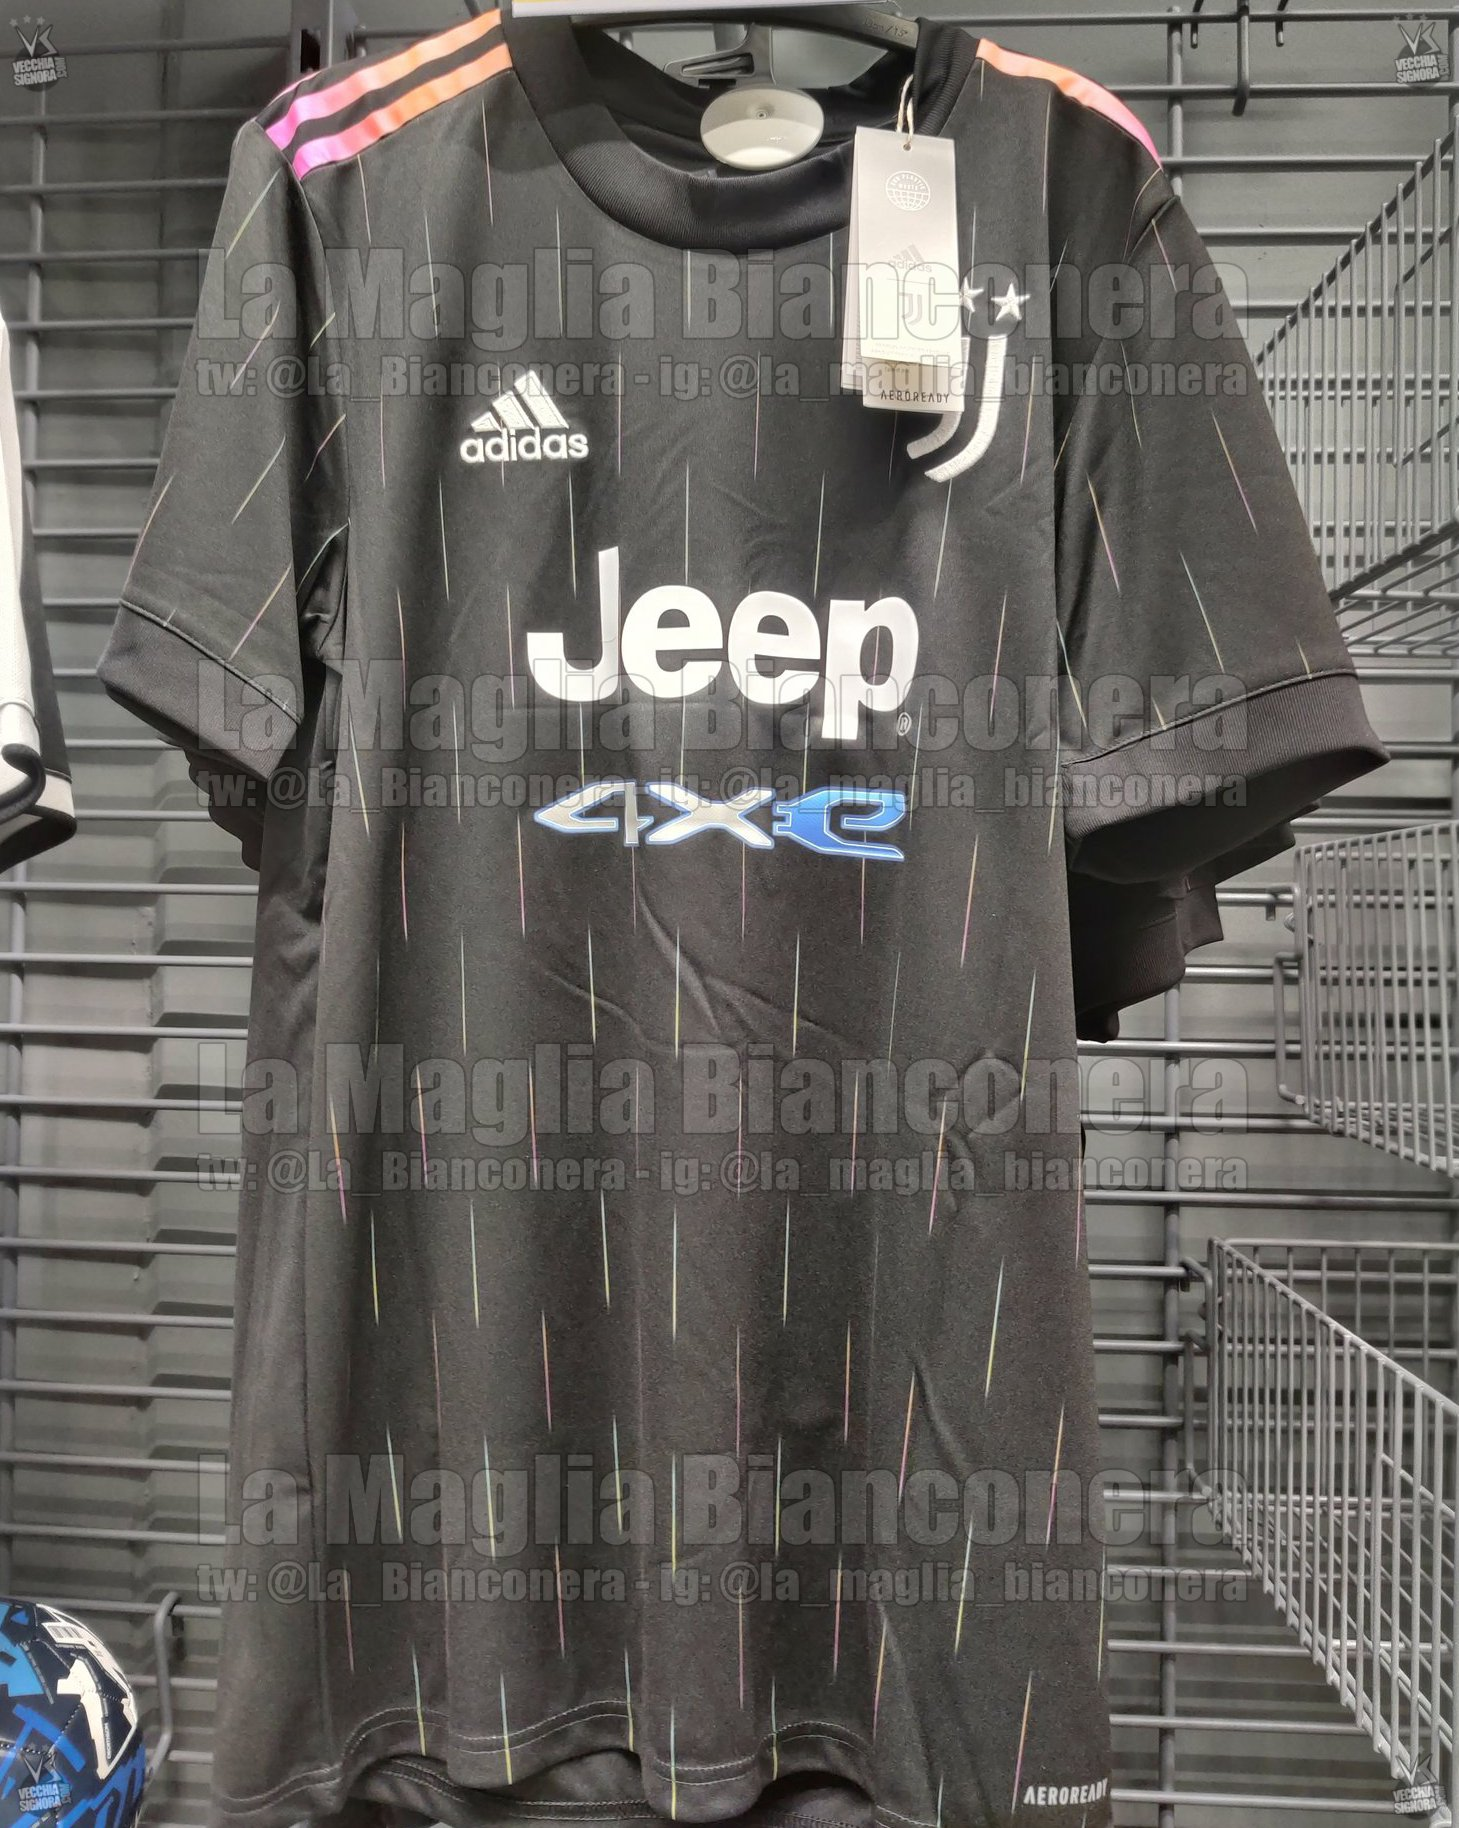 Juventus 2022 nouveau maillot exterieur Adidas